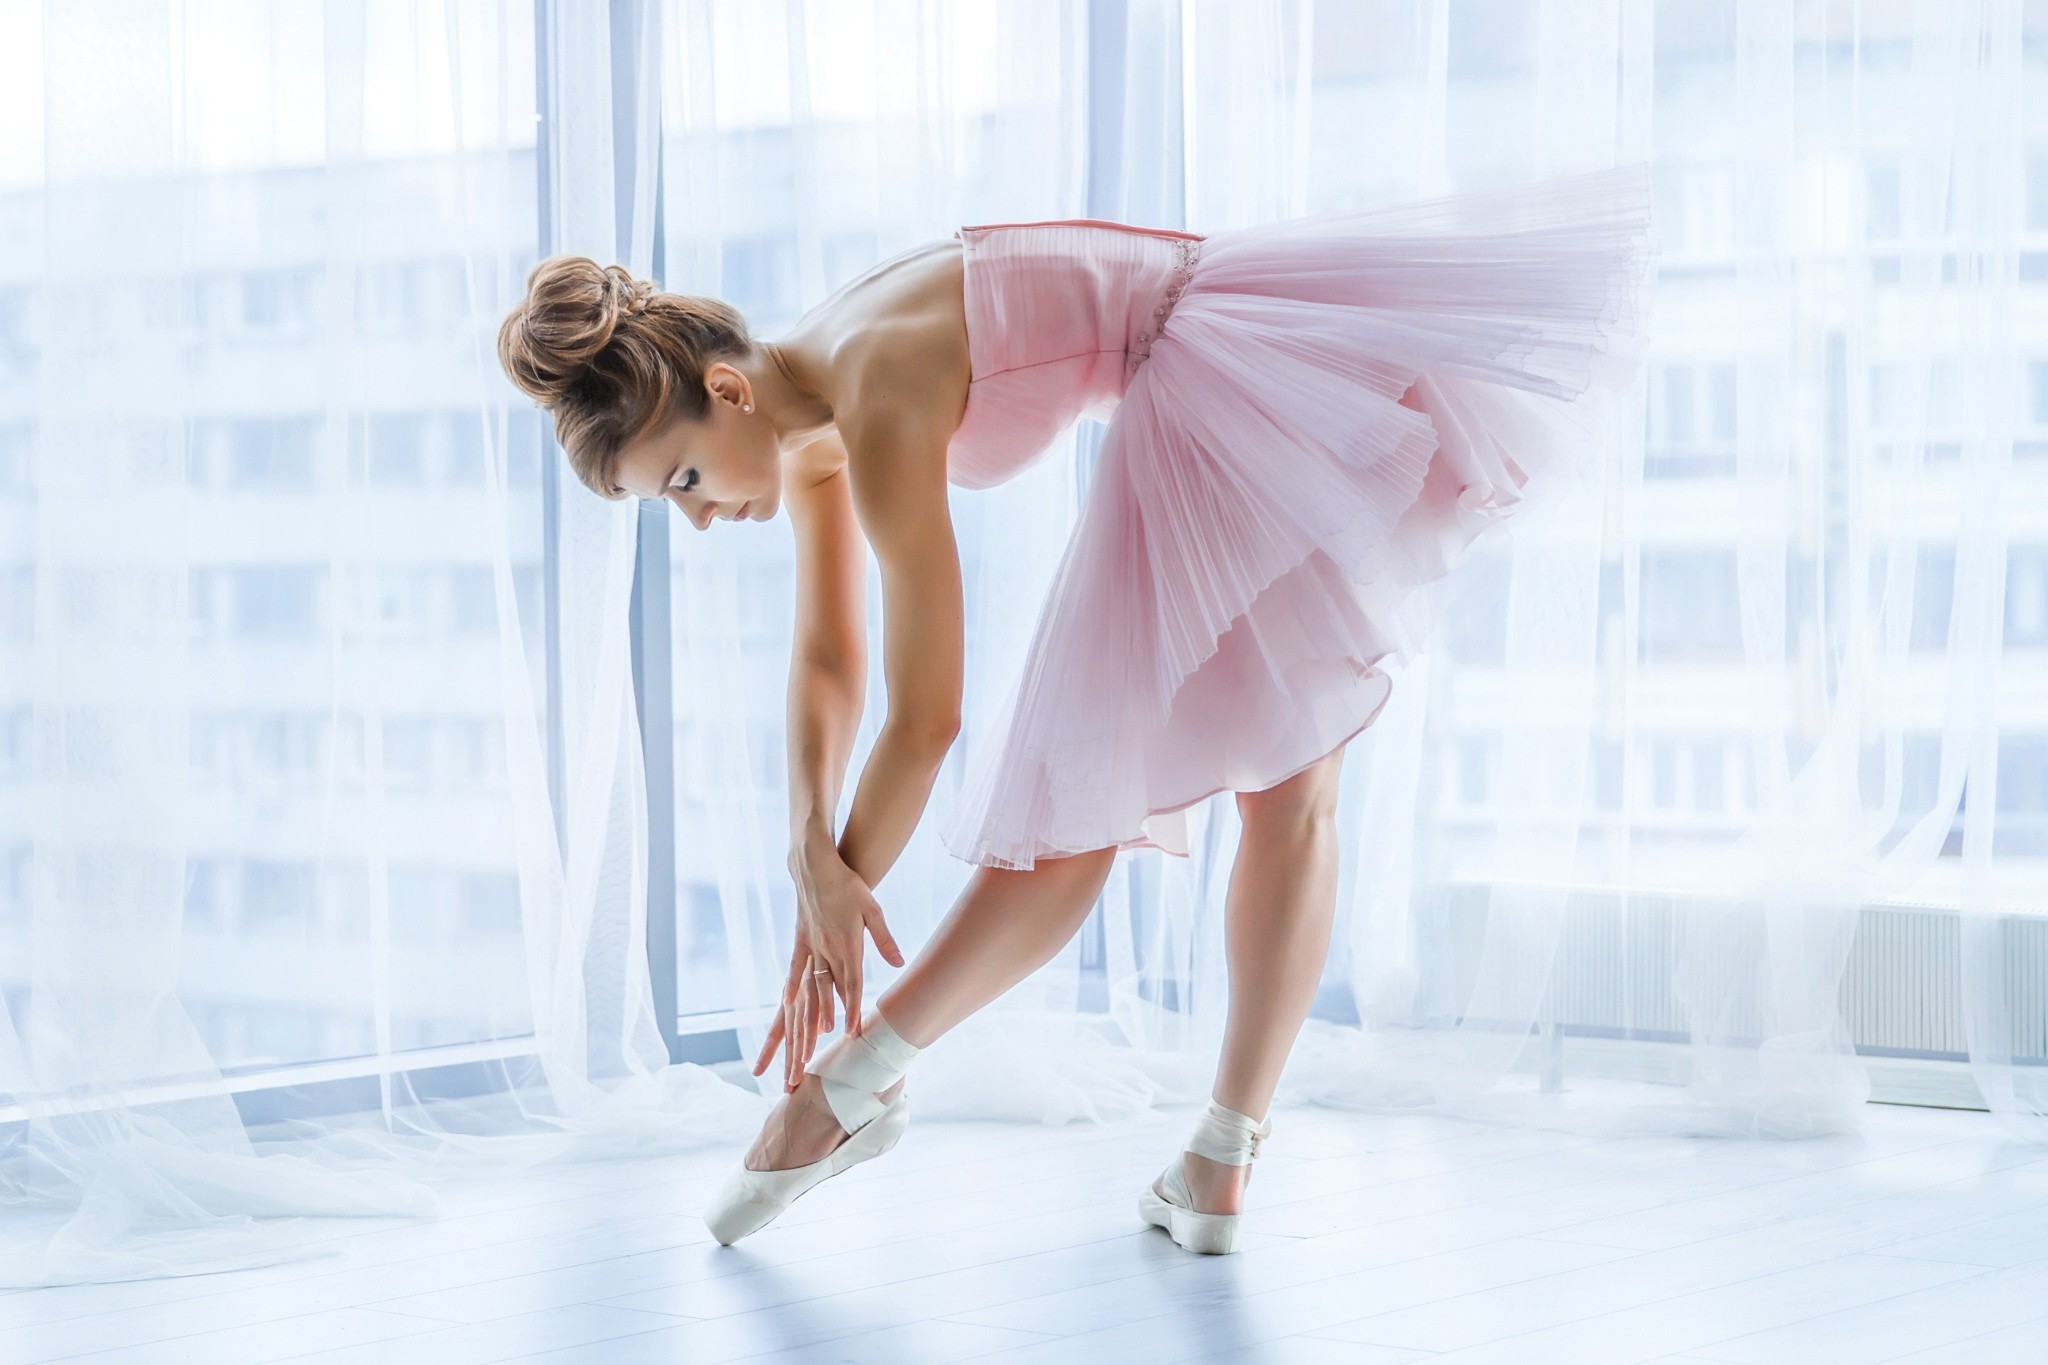 Ballerina Wallpaper (72+ images)